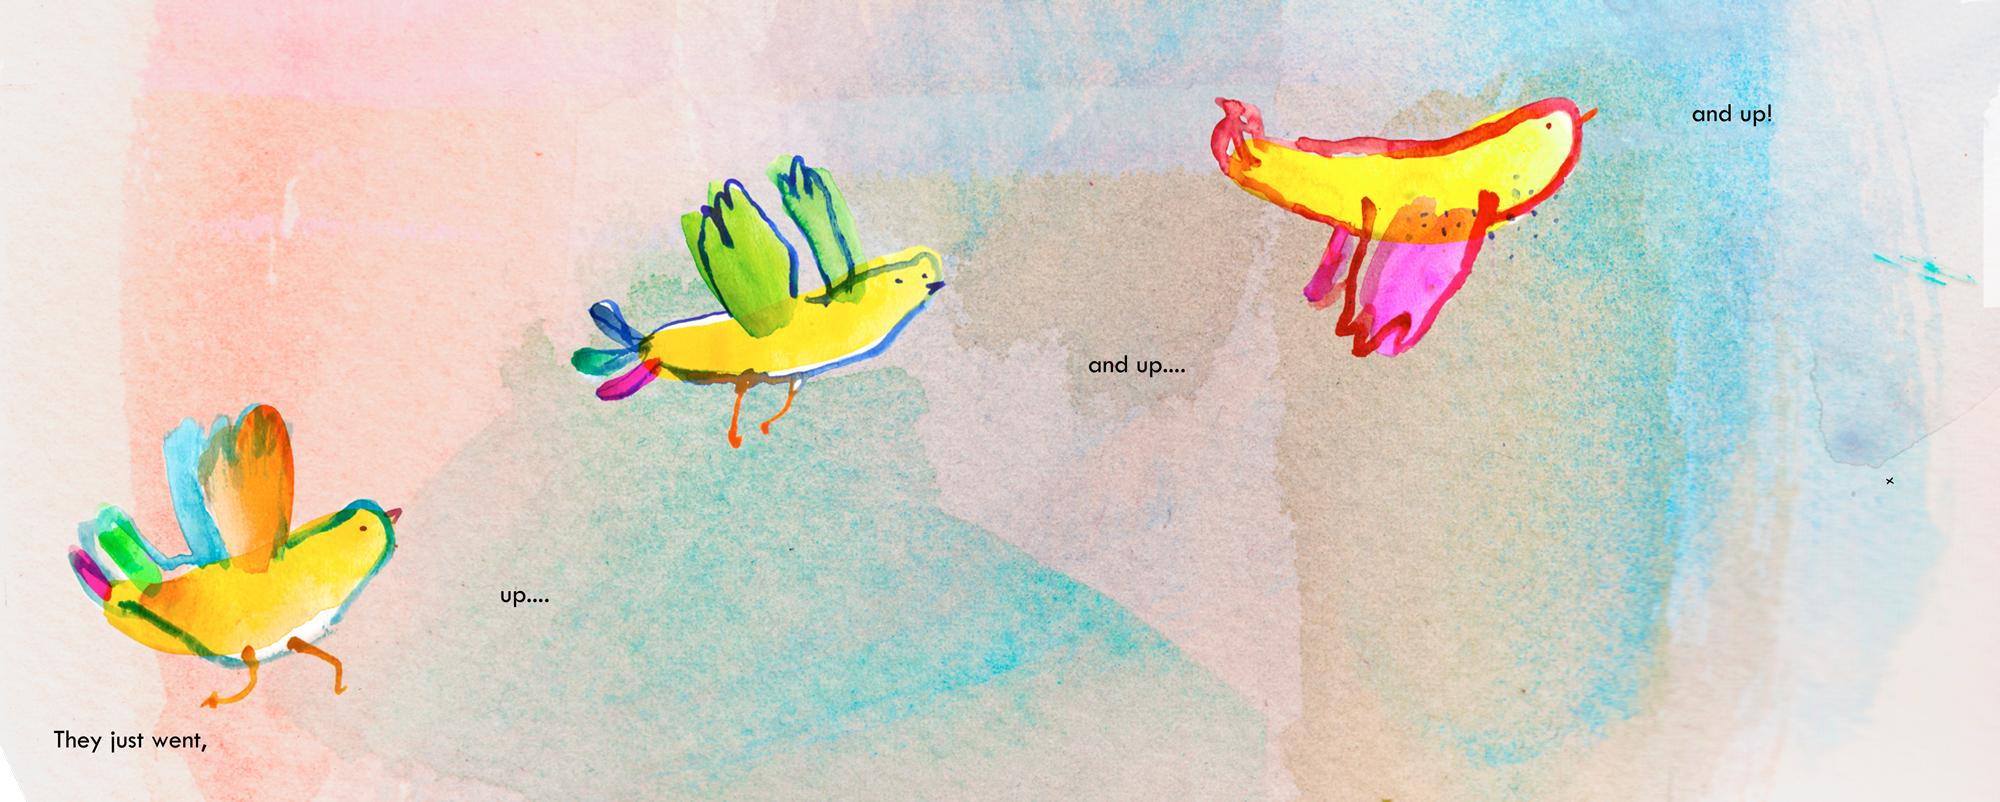 5) Birds_52x21cm_Digital+ Watercolour.jpg